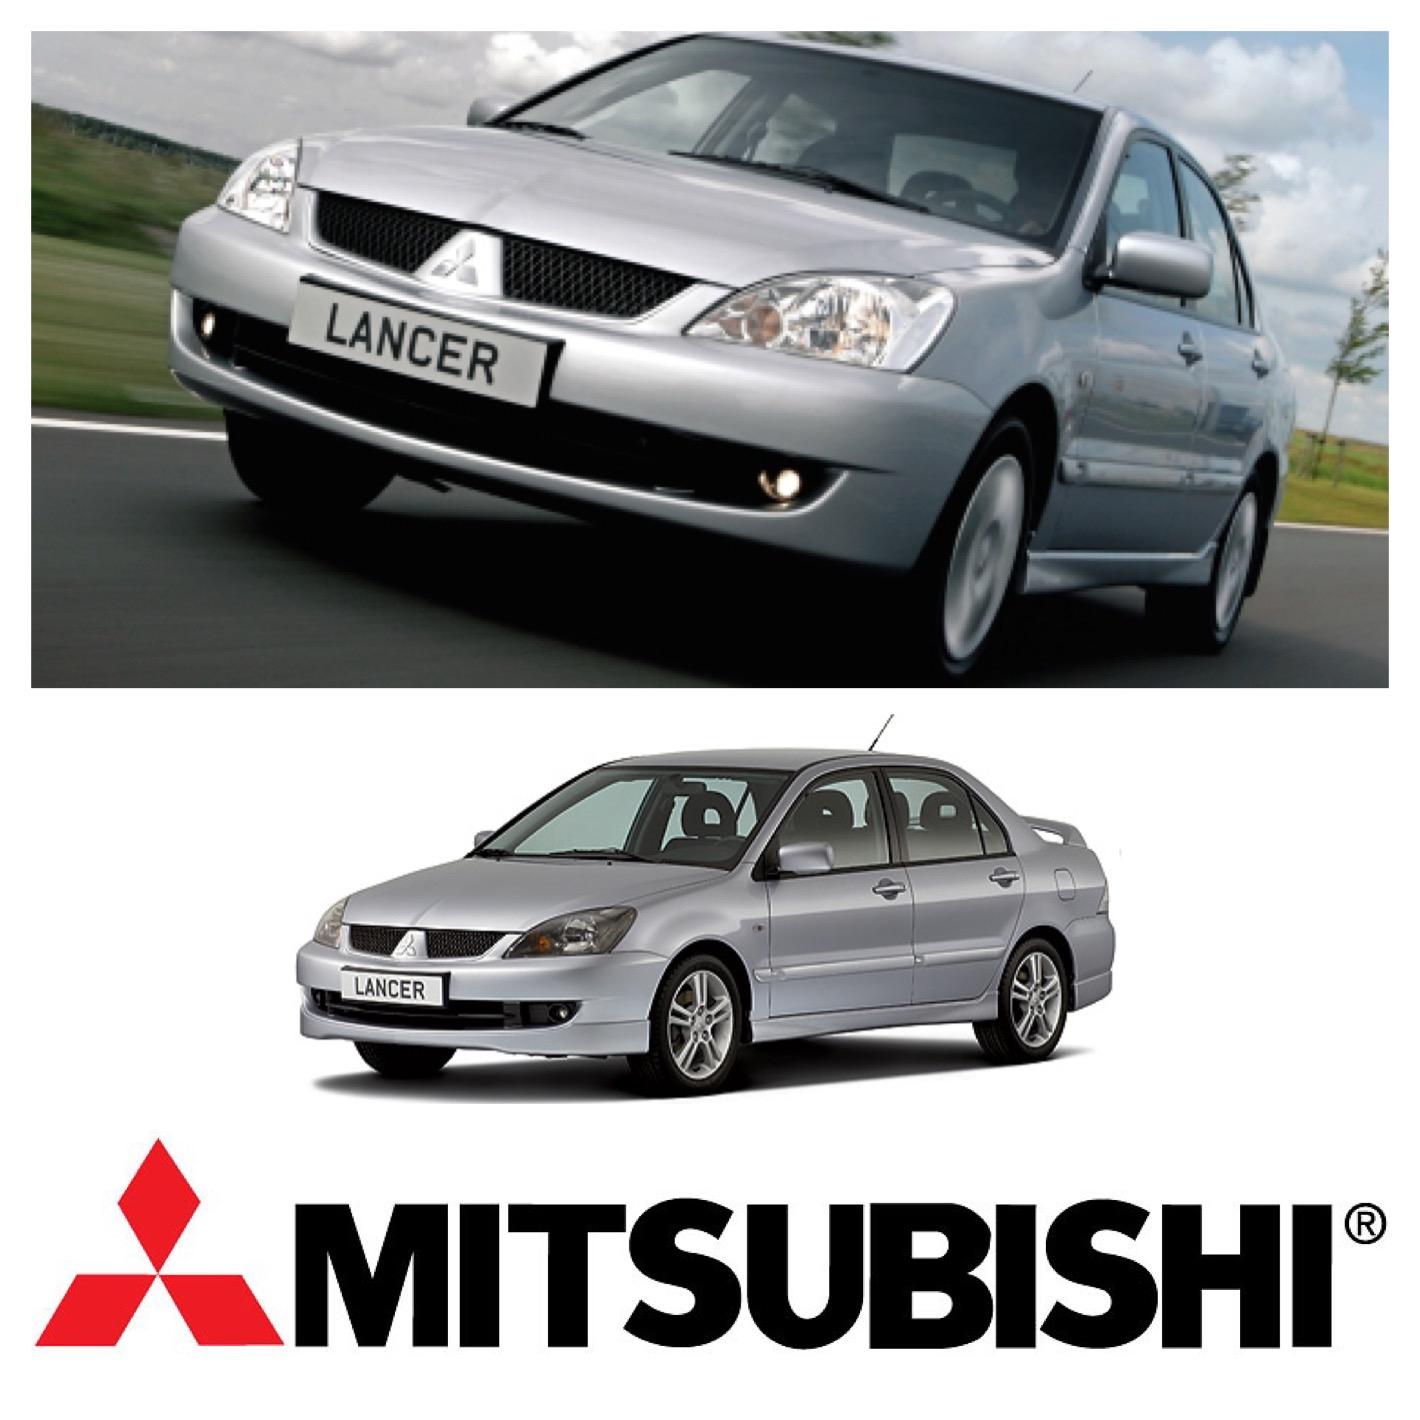 mitsubishi lancer 9 1.6 на газ